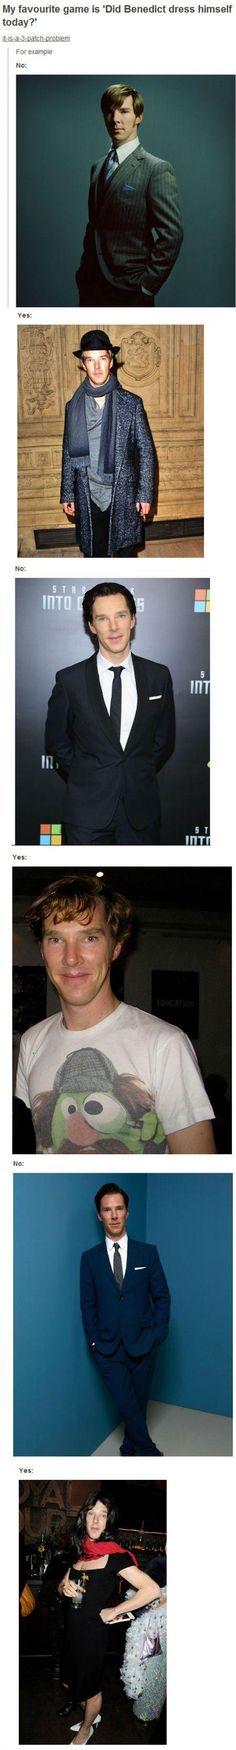 I love the Muppet Sherlock tee!! Plus I'm impressed at how well he rocks those heels!